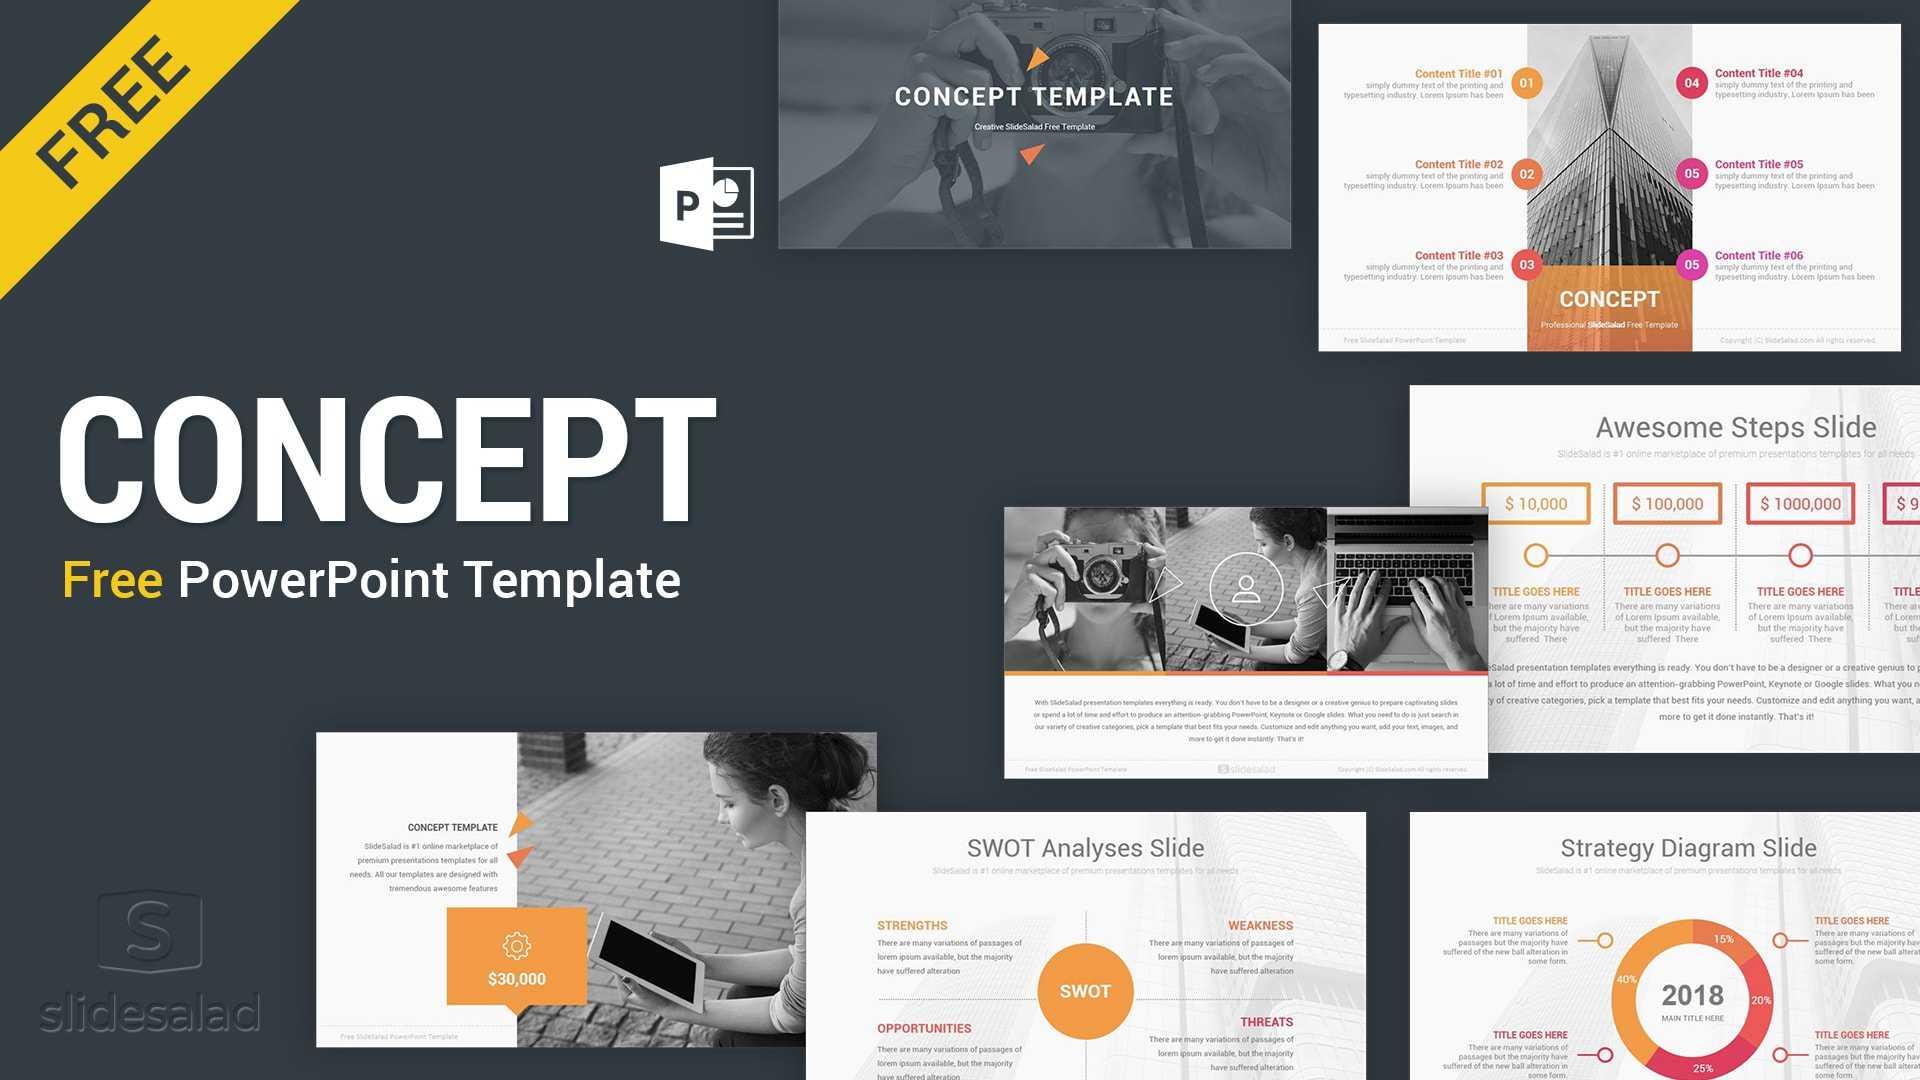 Best Free Presentation Templates Professional Designs 2019 regarding Virus Powerpoint Template Free Download